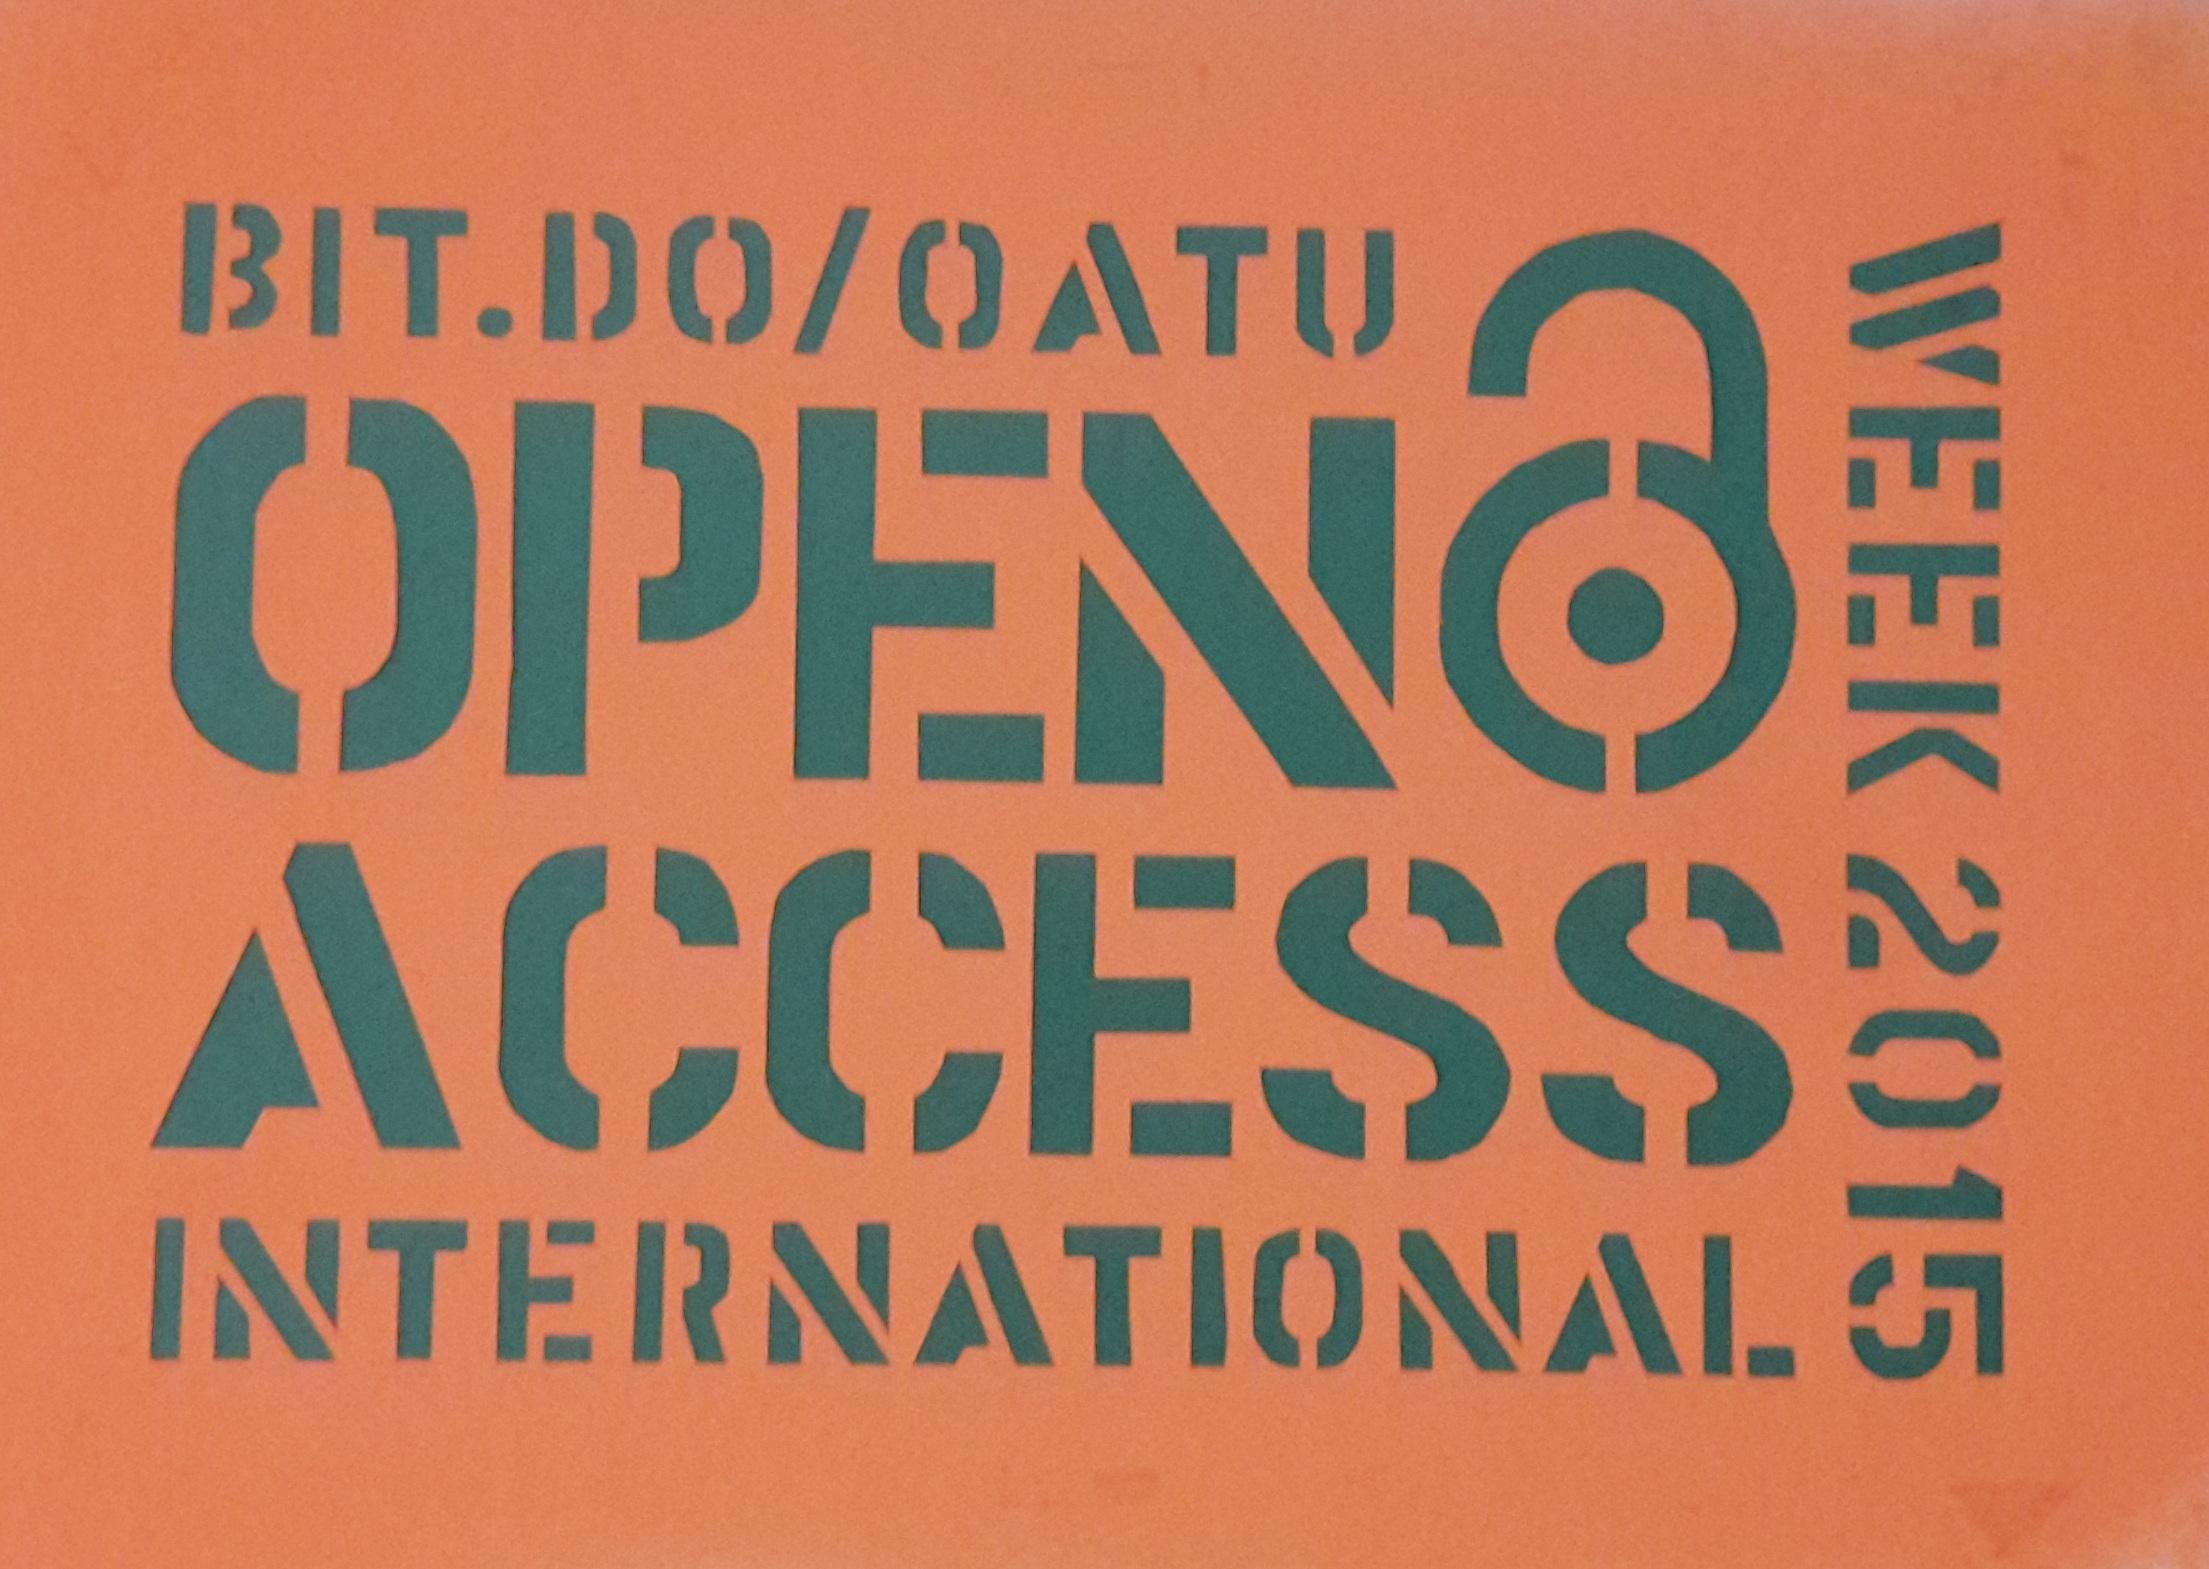 Internationale Open Access Week 2015 an der TU Berlin